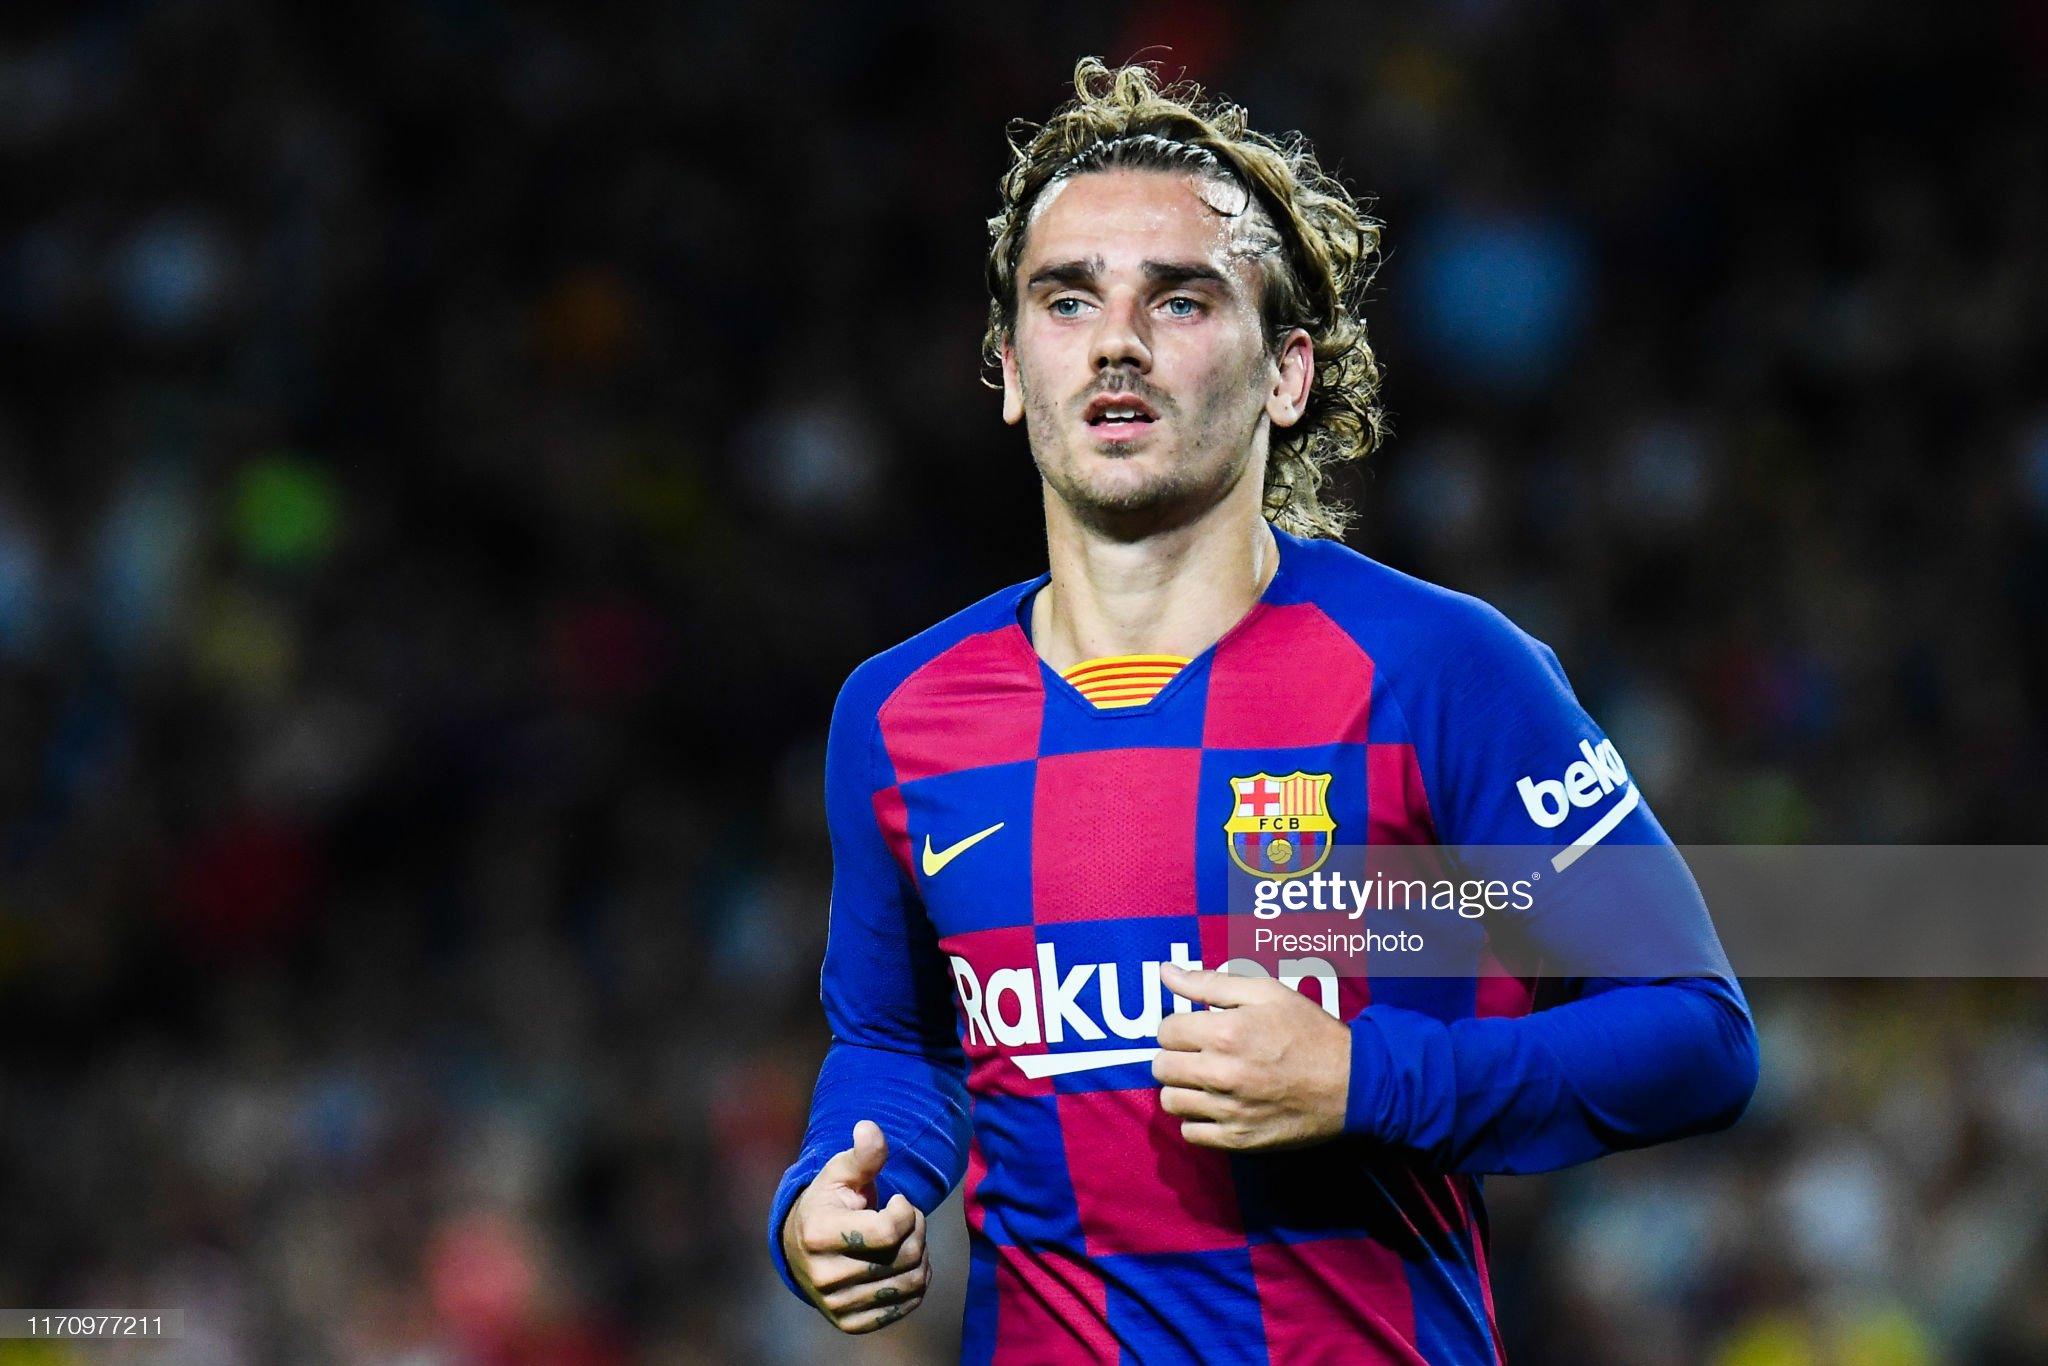 صور مباراة : برشلونة - فياريال 2-1 ( 24-09-2019 )  Antoine-griezmann-of-fc-barcelona-during-the-liga-match-between-and-picture-id1170977211?s=2048x2048